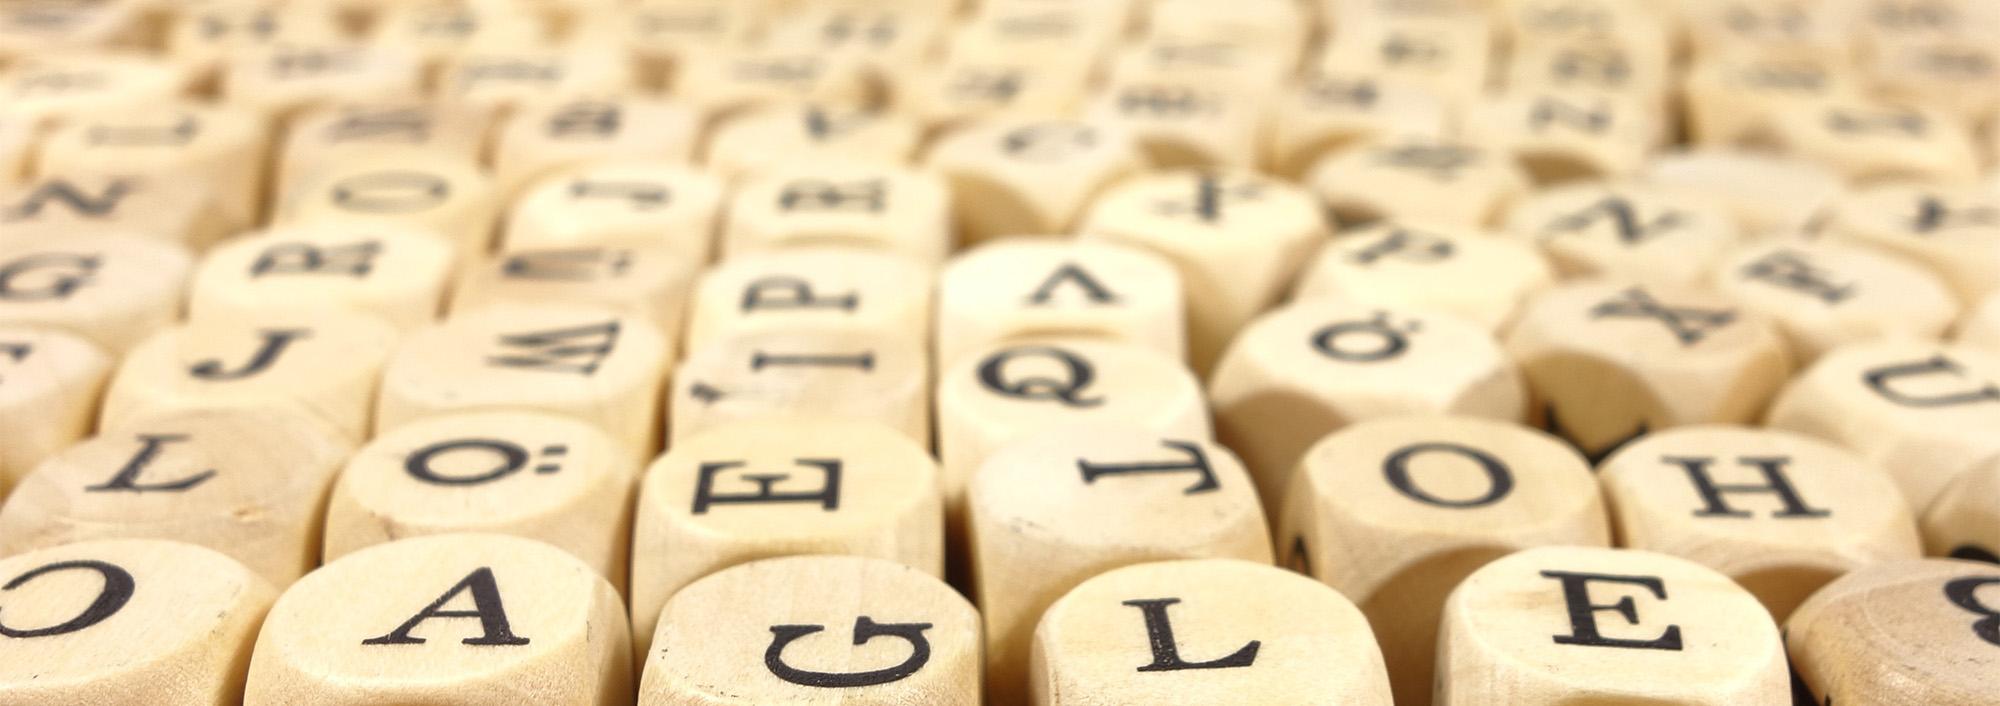 bogstaver-web